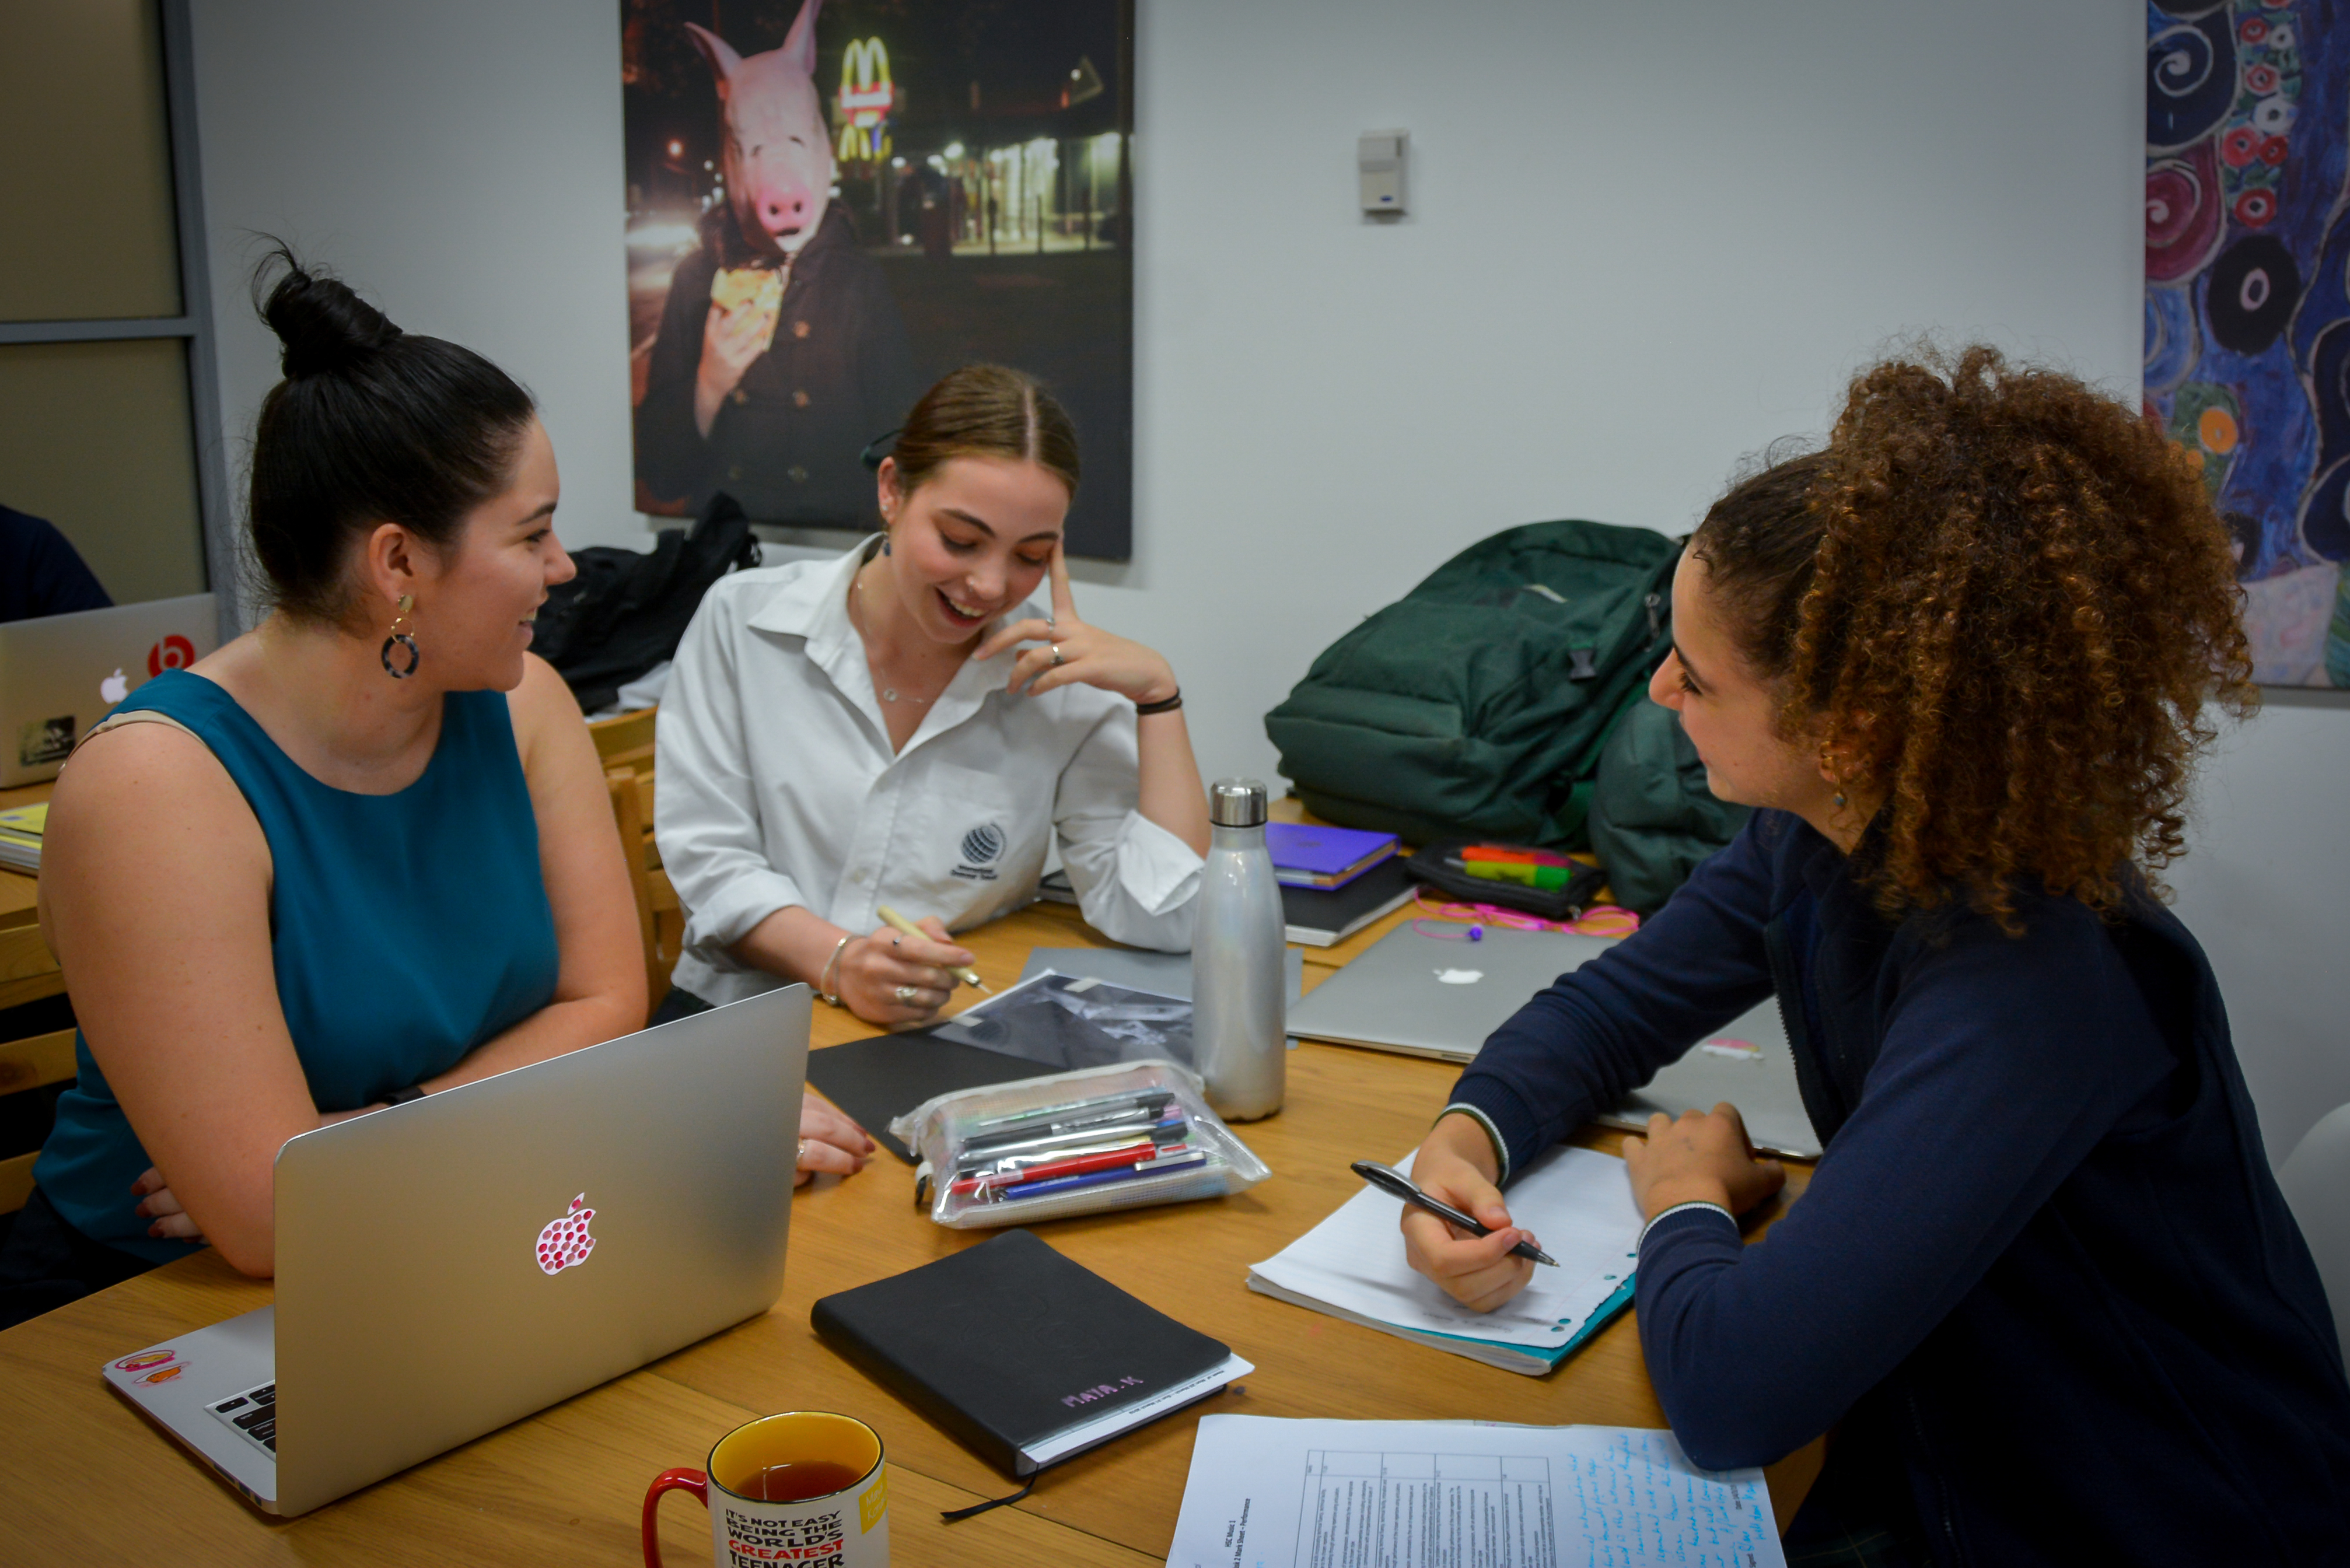 IGS 2019 Scholar Bridget Farkas with Year 12 students